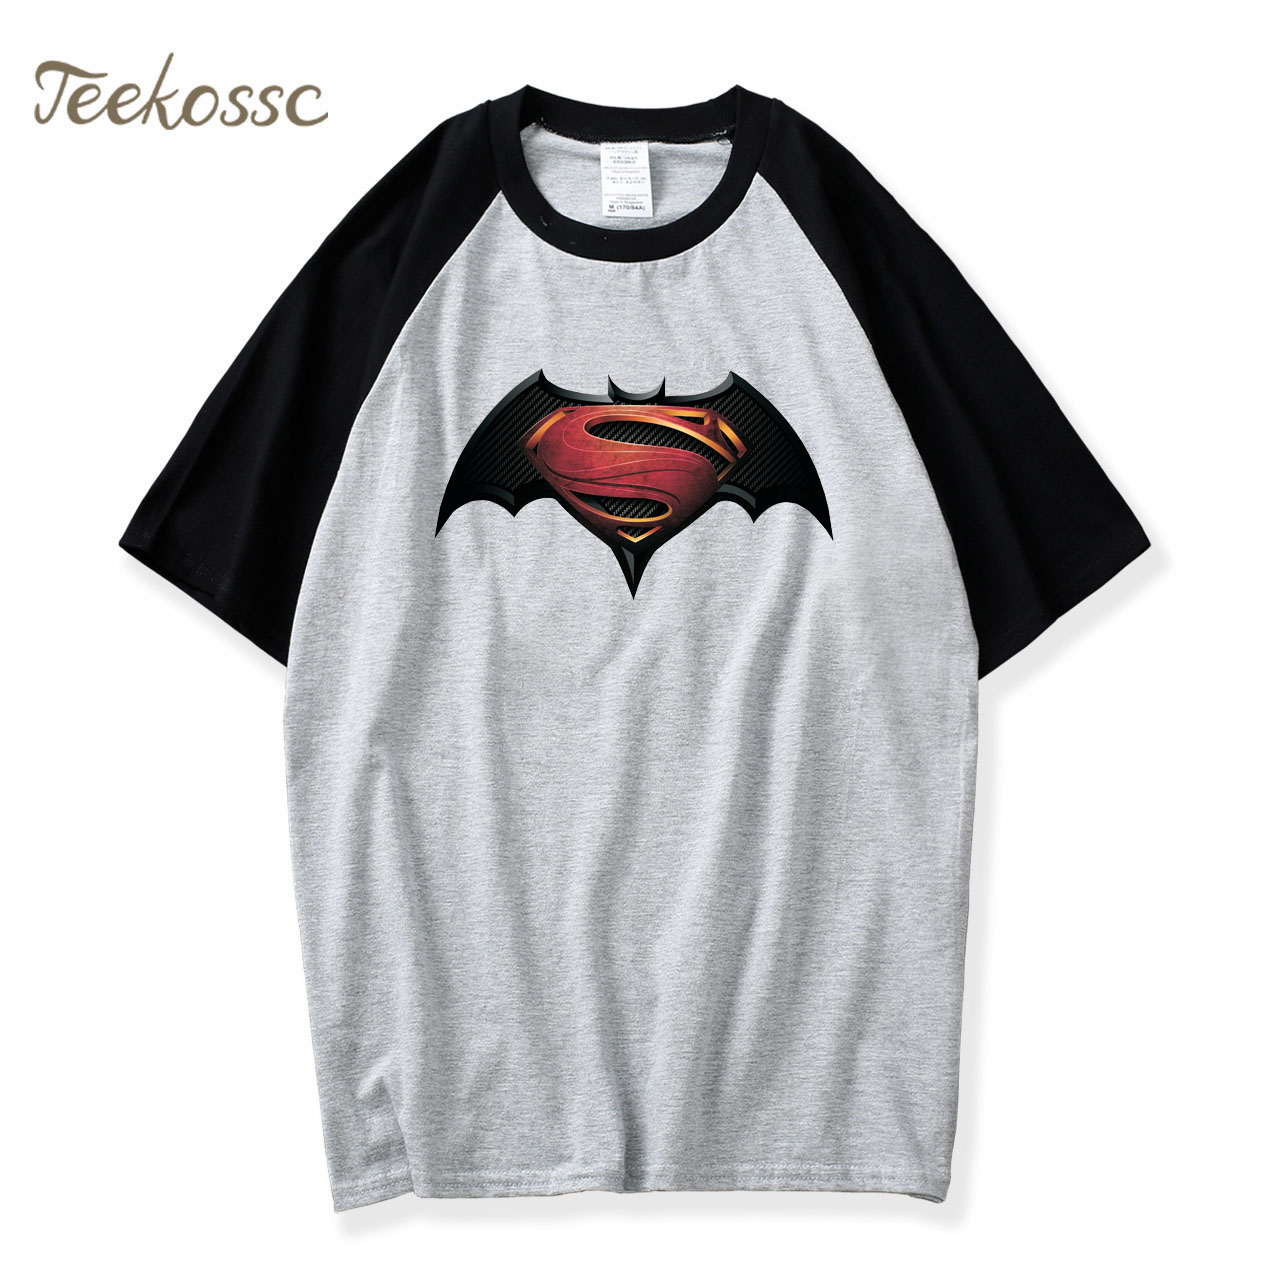 Bat T Shirt 2018 Hot Sale Summer Fashion Raglan Tshirts Mens Casual Loose Camiseta 100% Cotton Men Short Sleeve T-Shirt Tops Tee